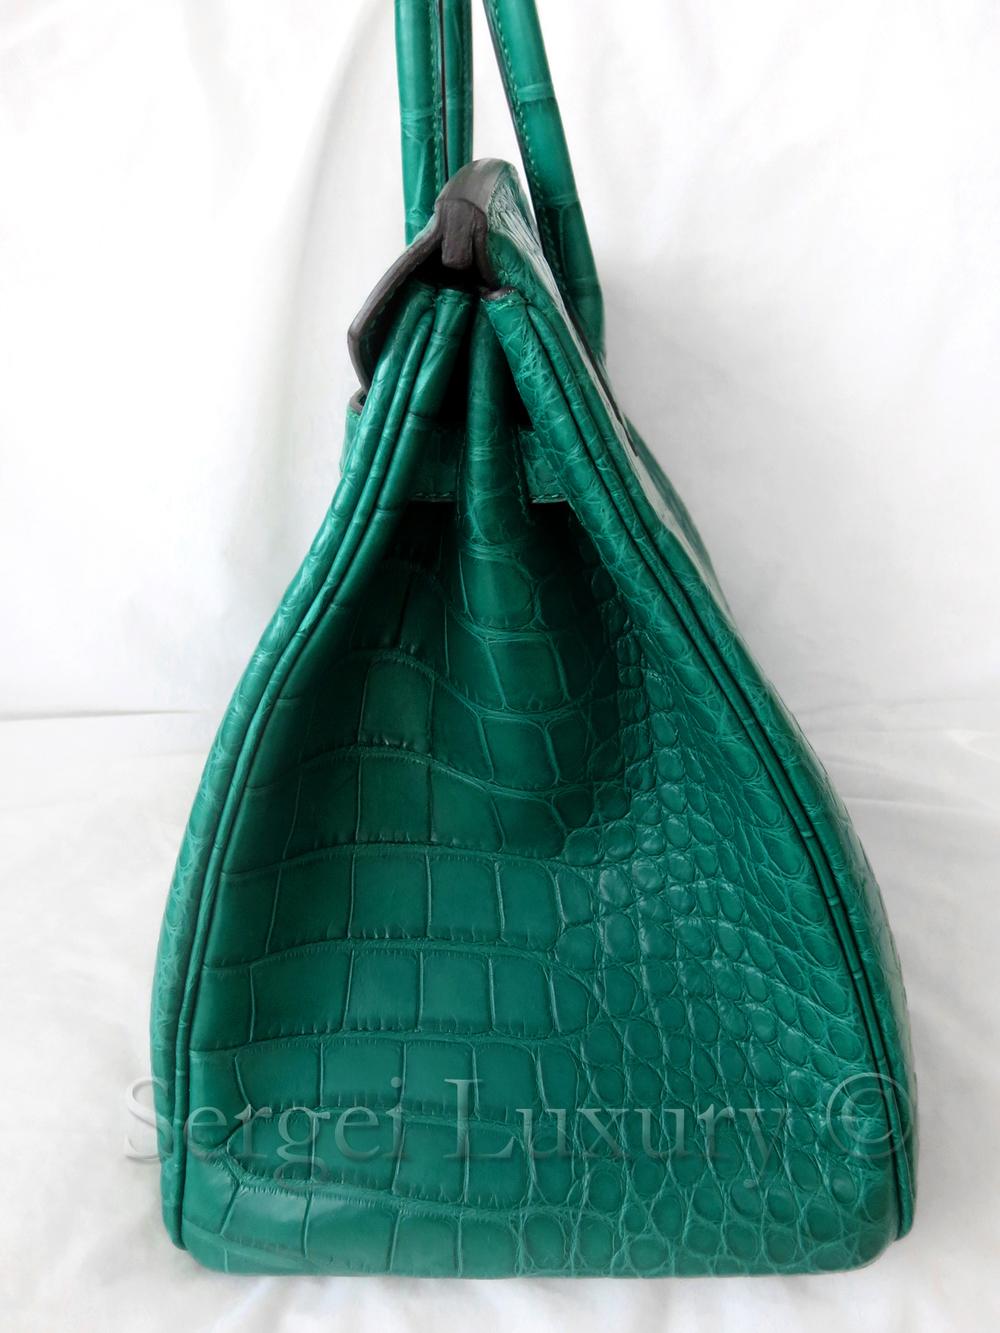 383daef557d4 NEW Hermes Birkin 35 Malachite Green Emerald Matte Crocodile Alligator Tote  bag — Sergei Luxury